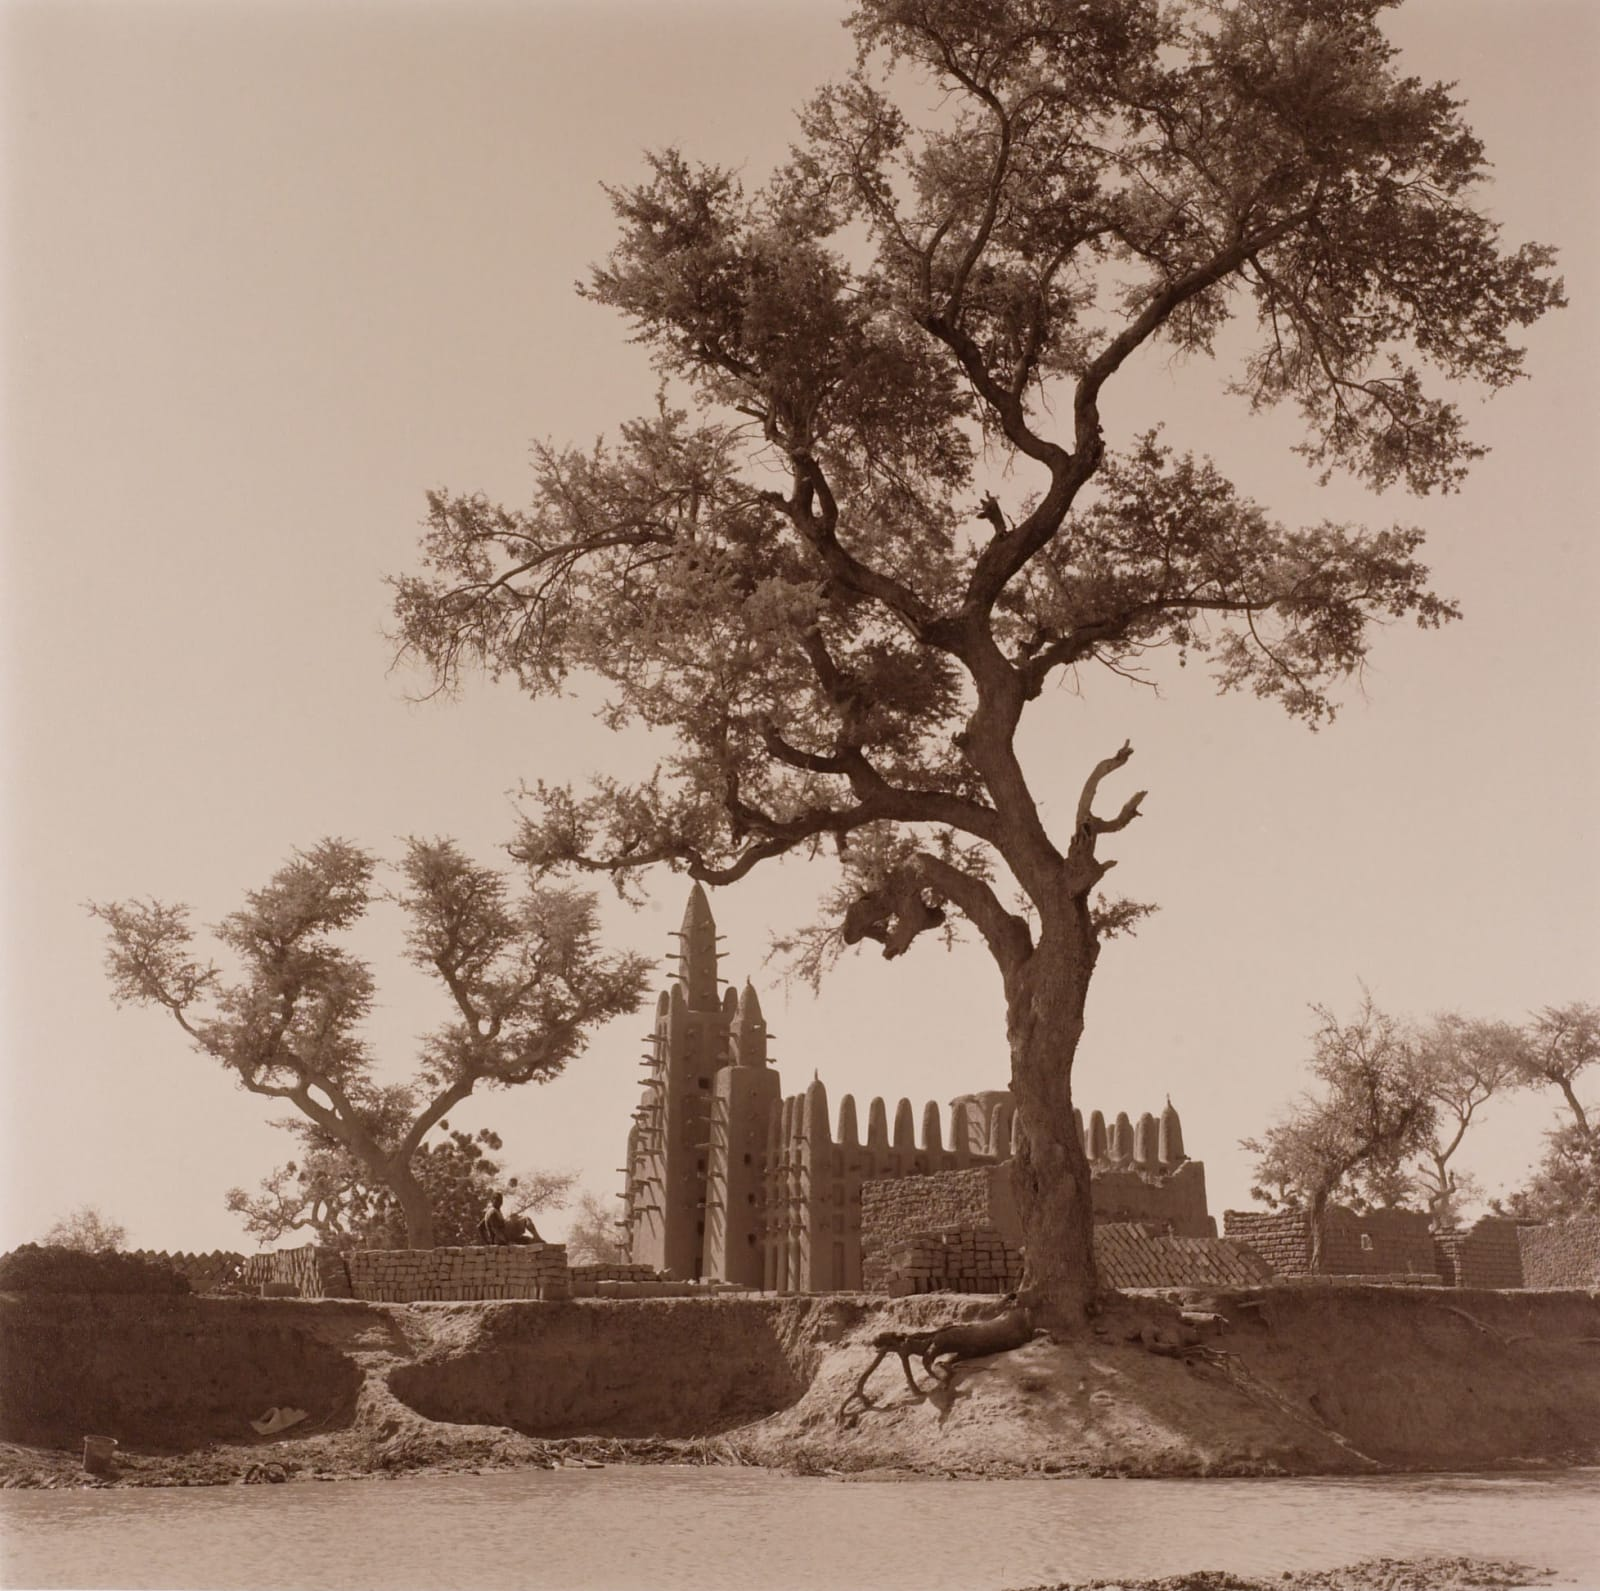 Mosque of Djenne, Mali behind beautiful tree, by Lynn Davis